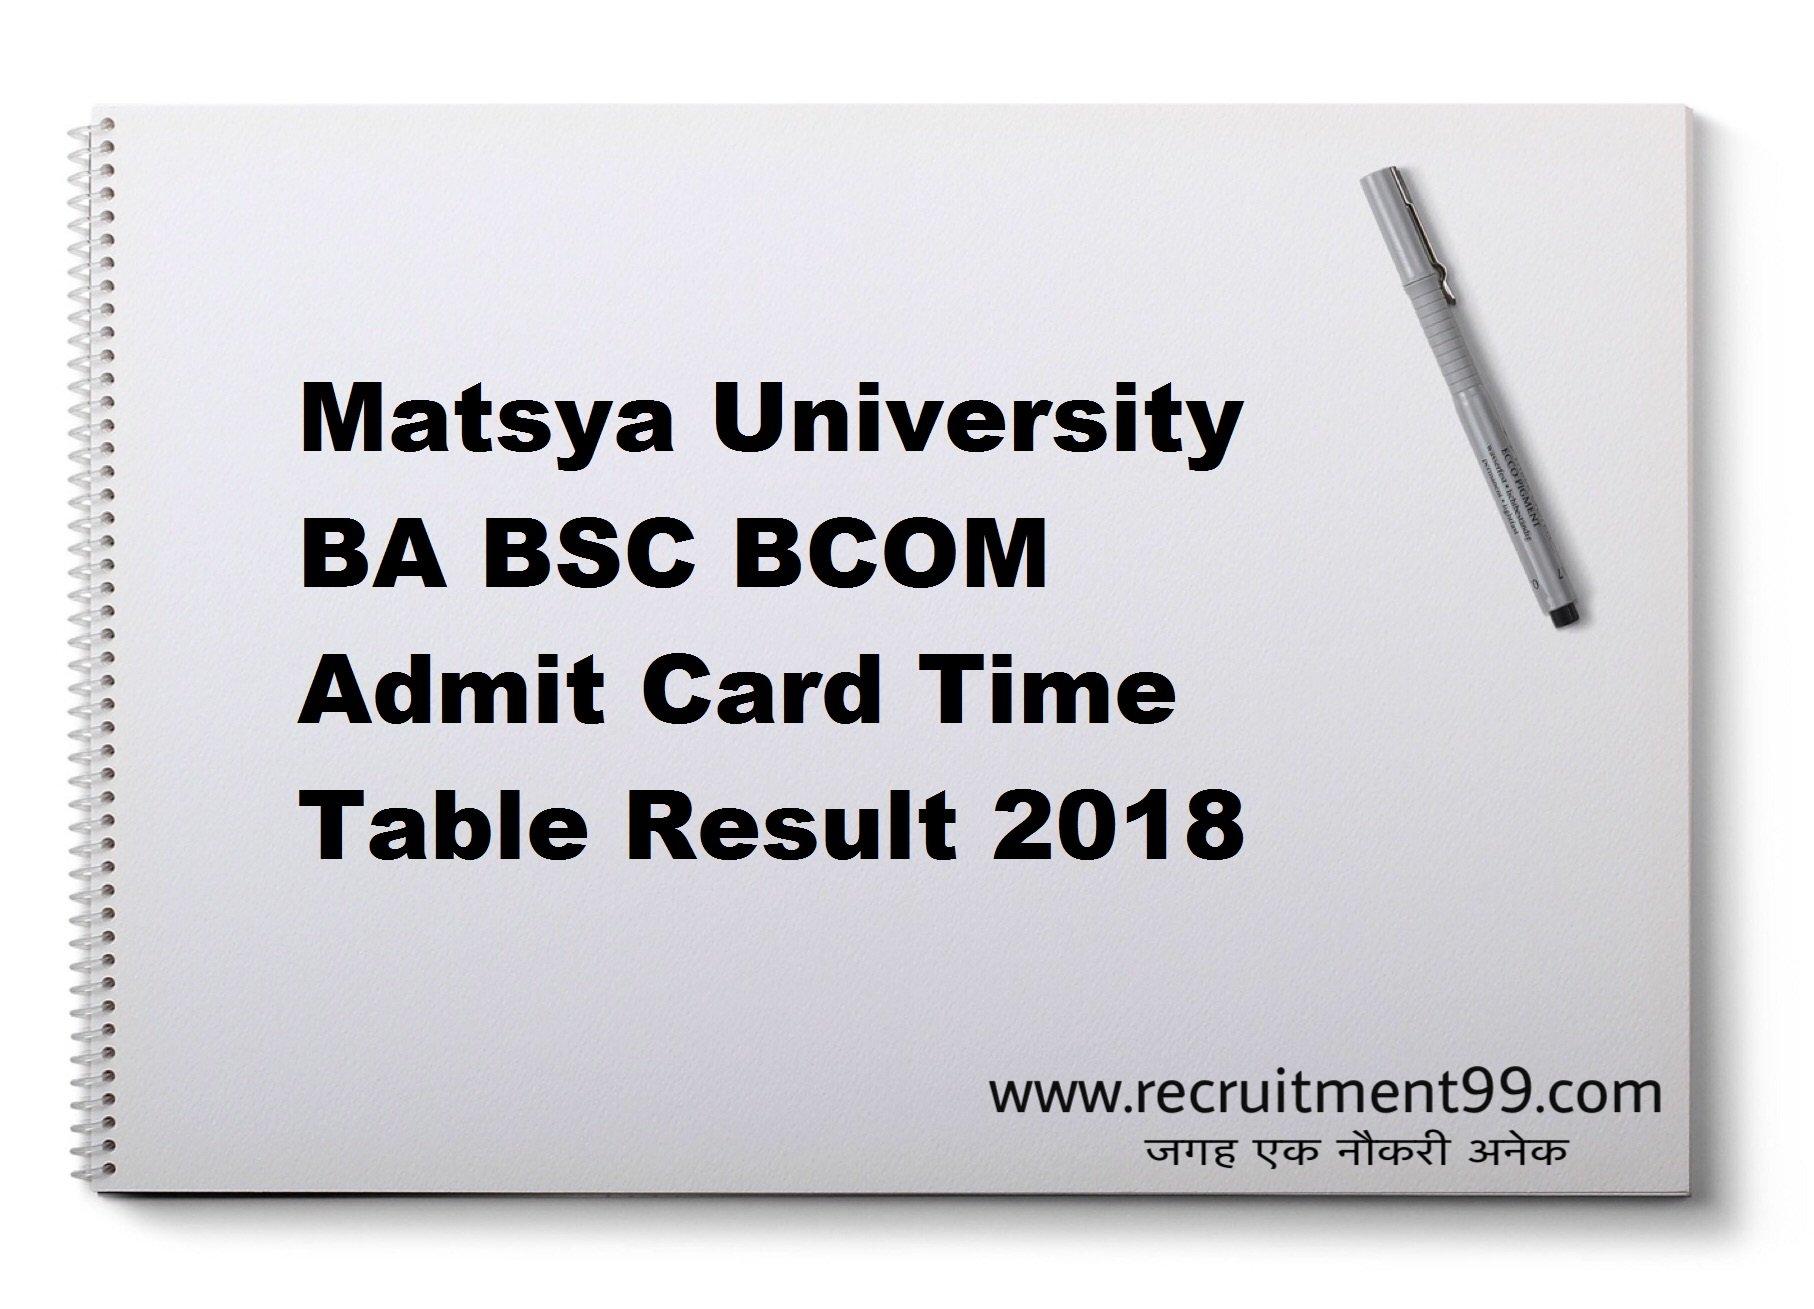 Matsya University BA BSC BCOM Admit Card Time Table Result 2018